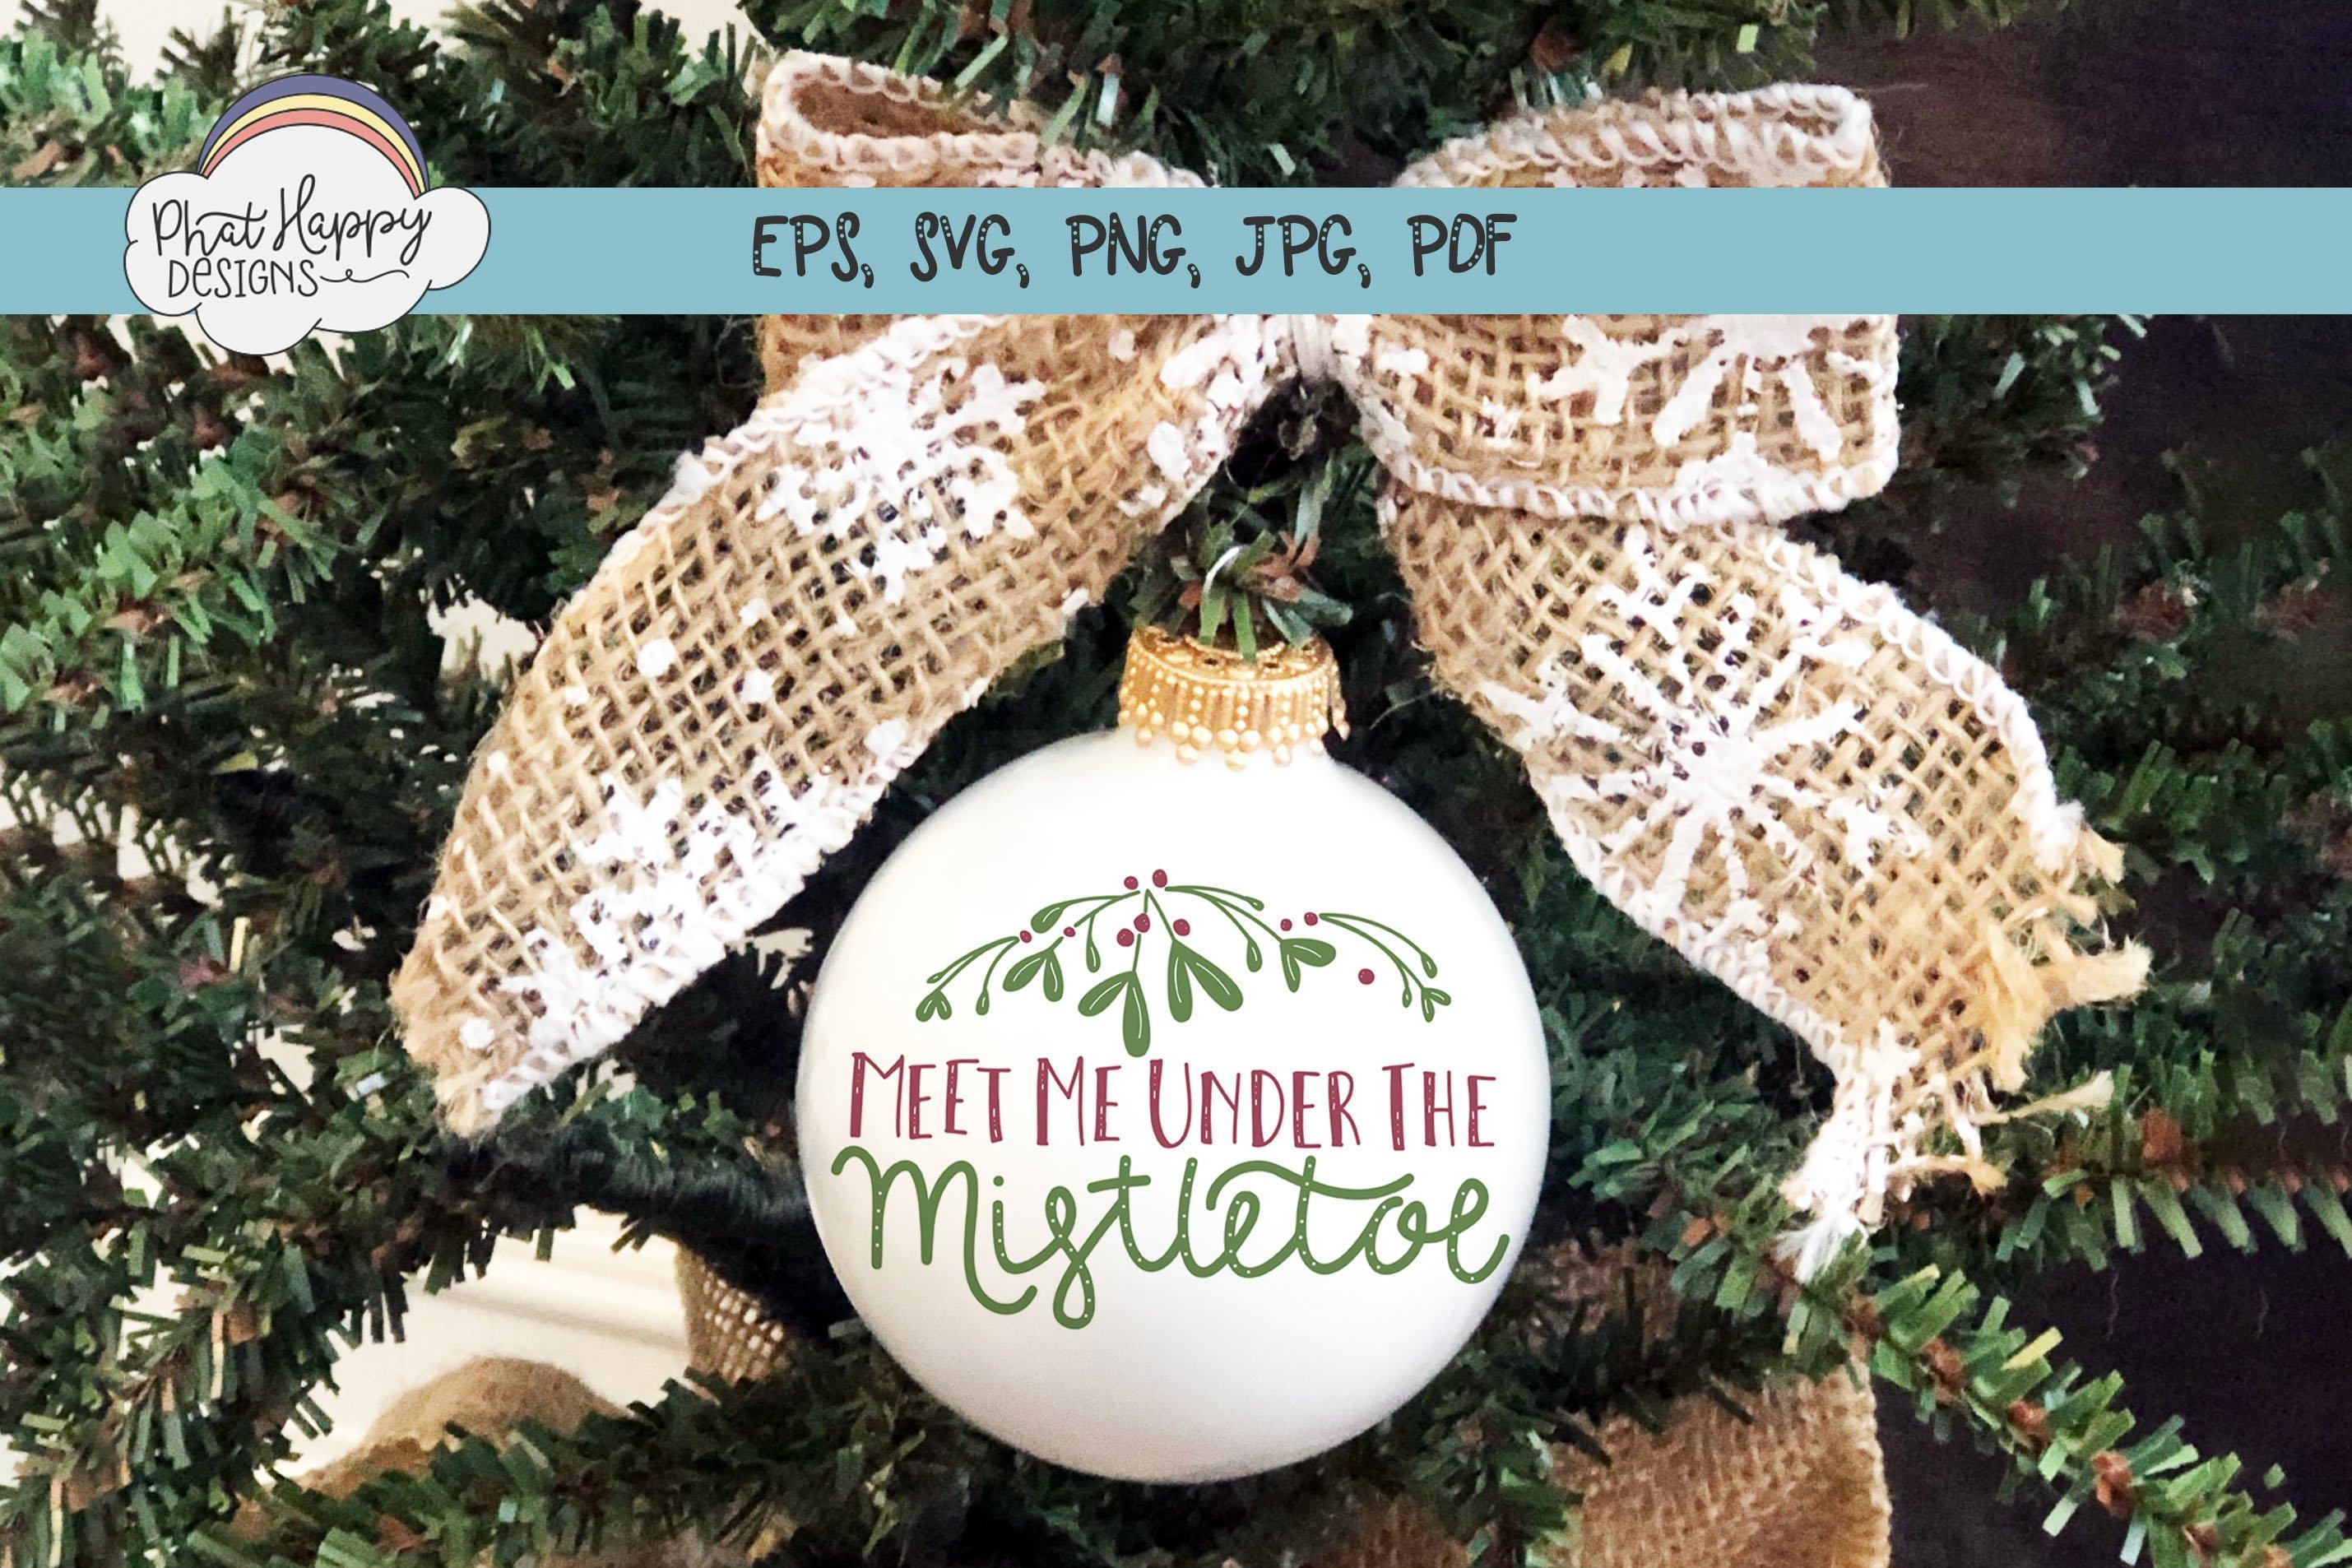 Under the Mistletoe - Hand Lettered Christmas SVG example image 4